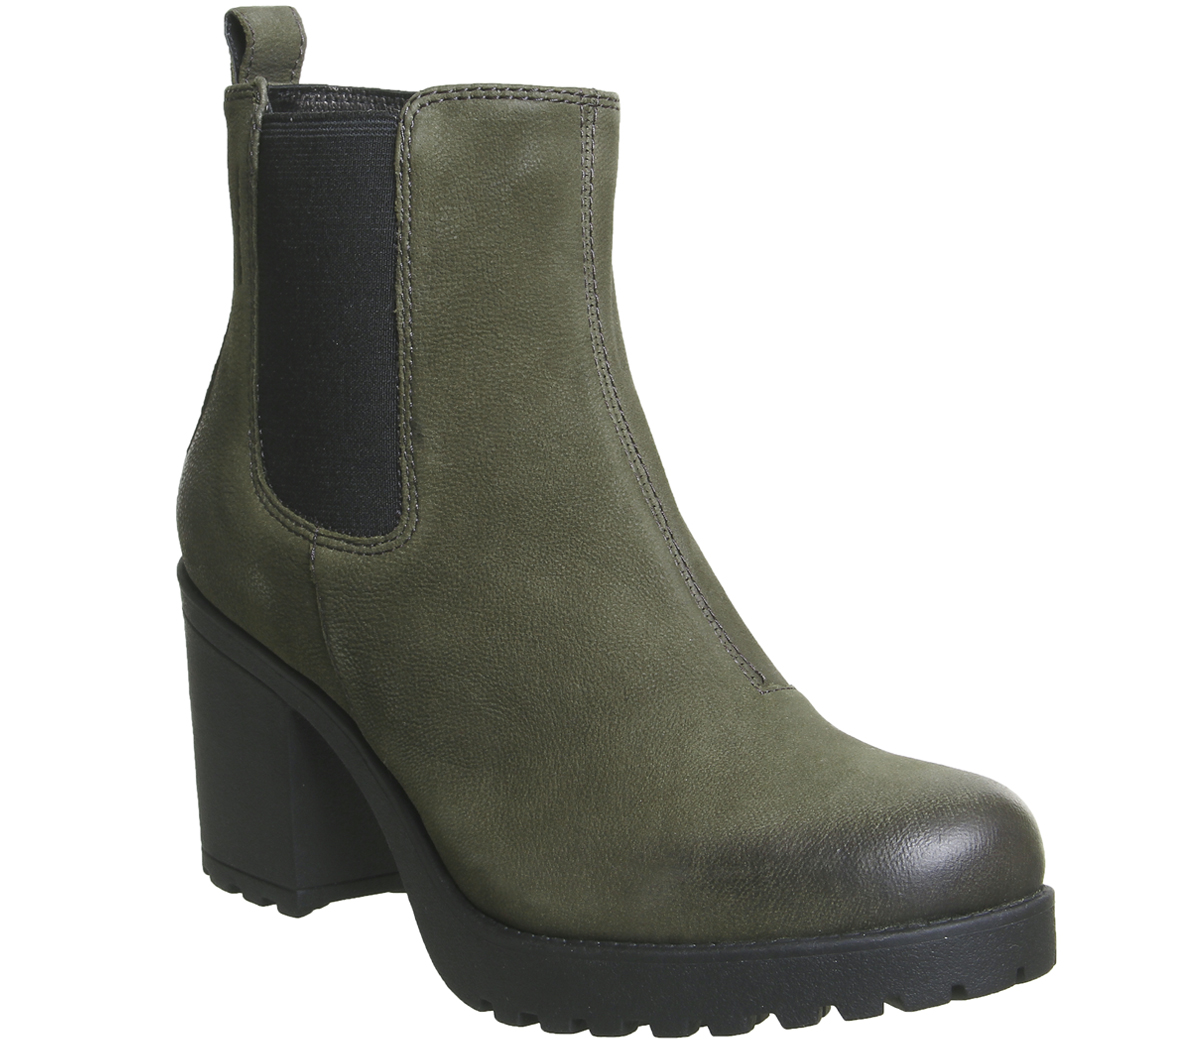 4a460f668 Sentinel Womens Vagabond Grace Heeled Chelsea Boots Dark Olive Nubuck Boots